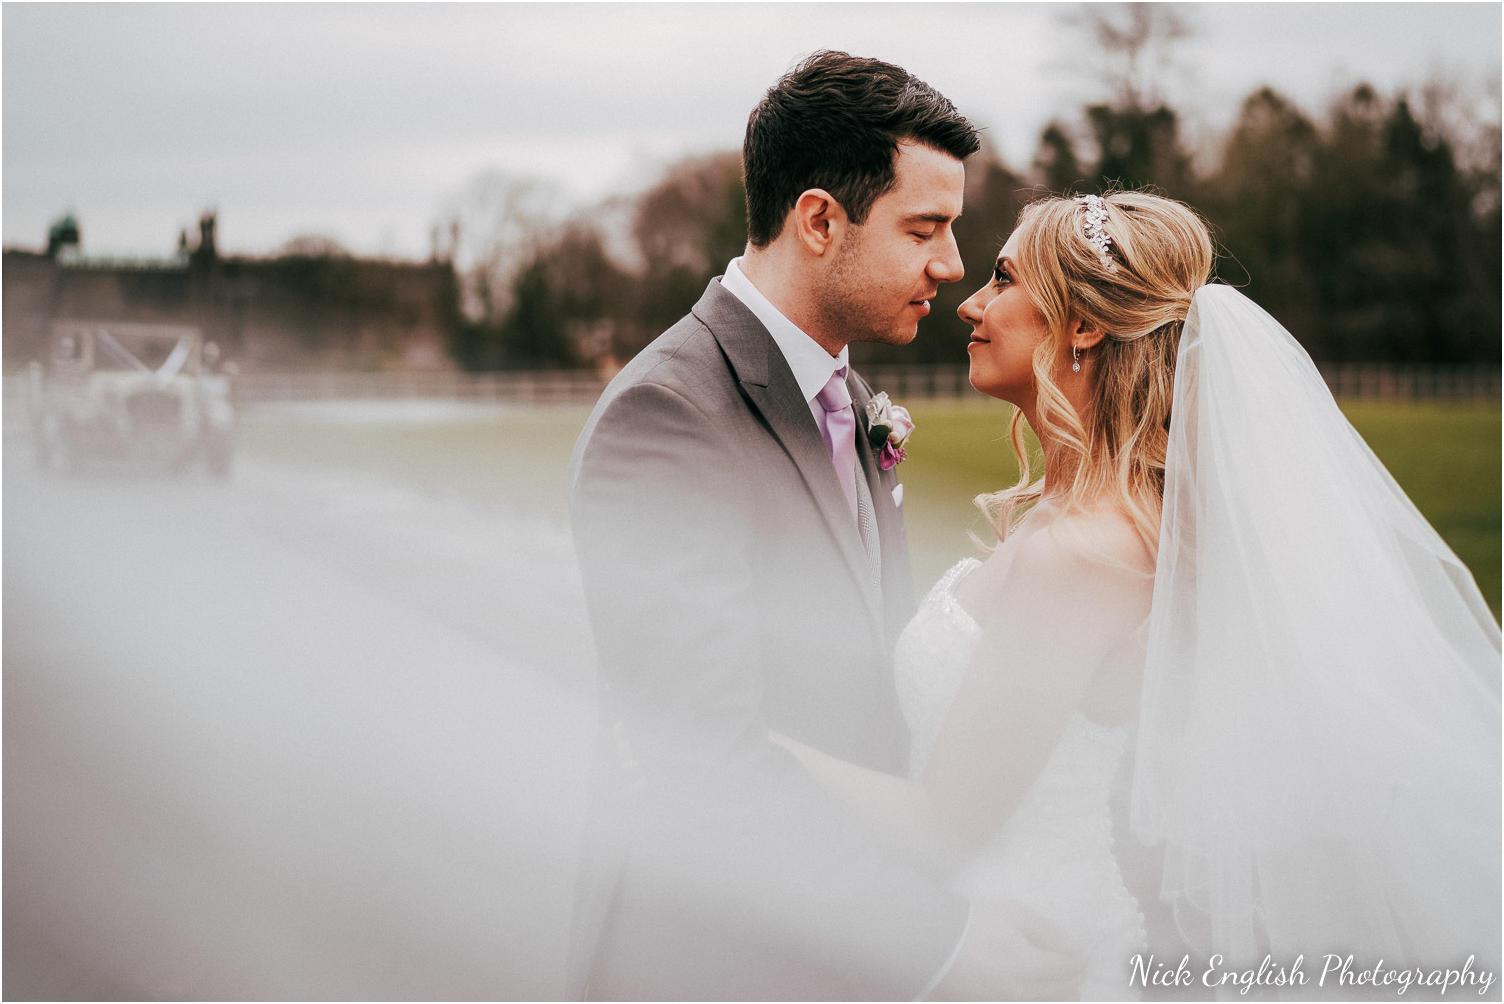 Mitton_Hall_Wedding_Photographer_2018-97.jpg